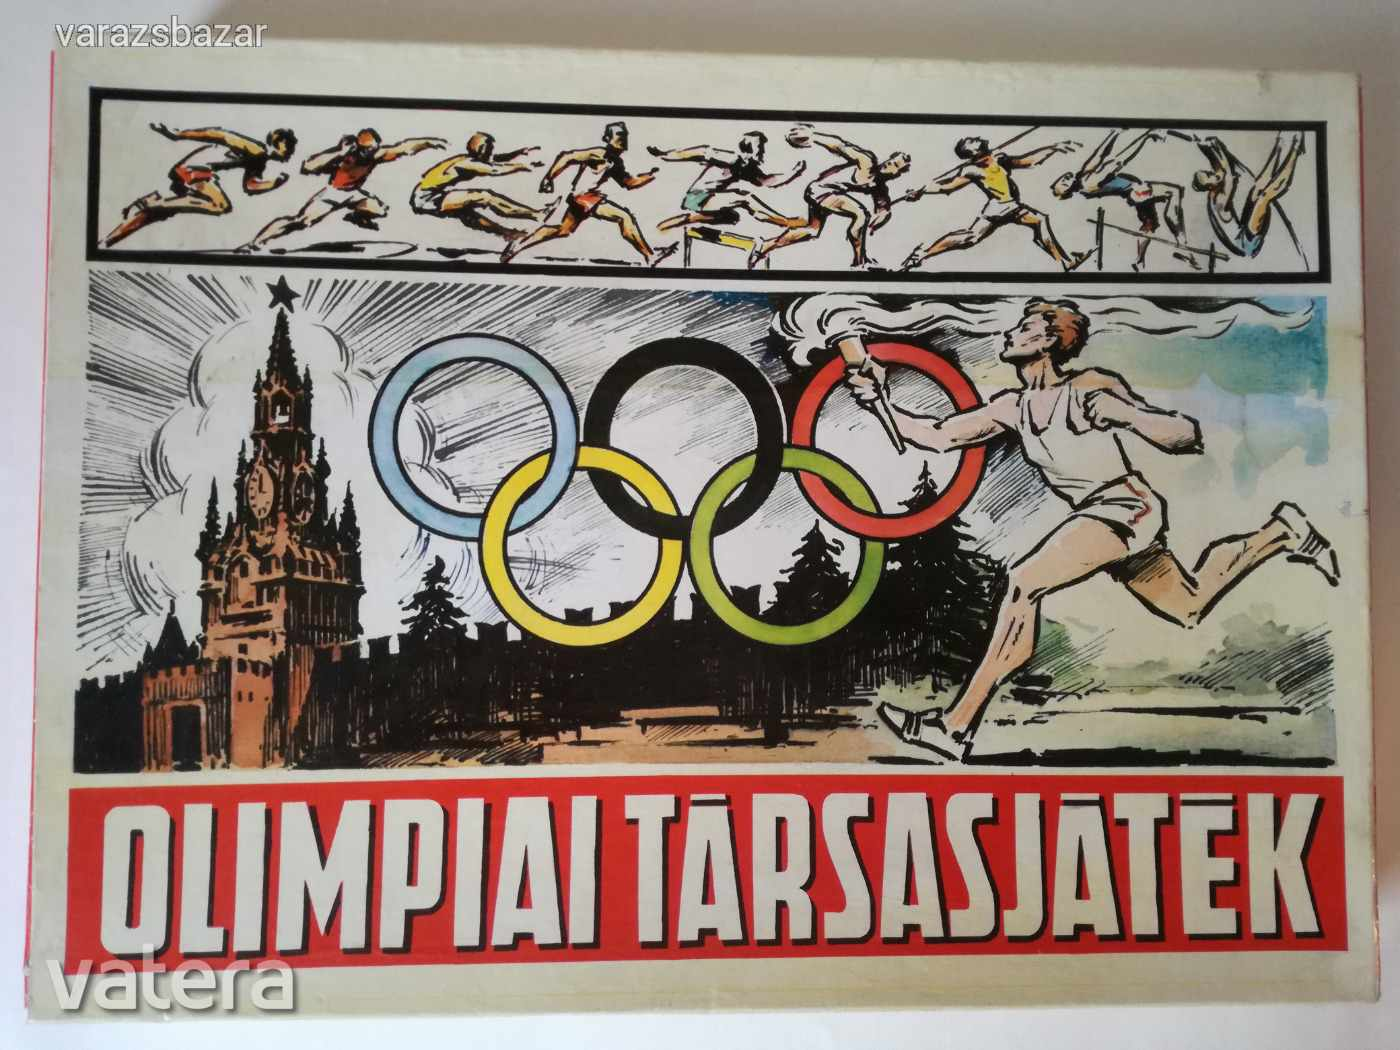 olimpiai-tarsasjatek-2-81-retro-0a9a_1_big.jpg